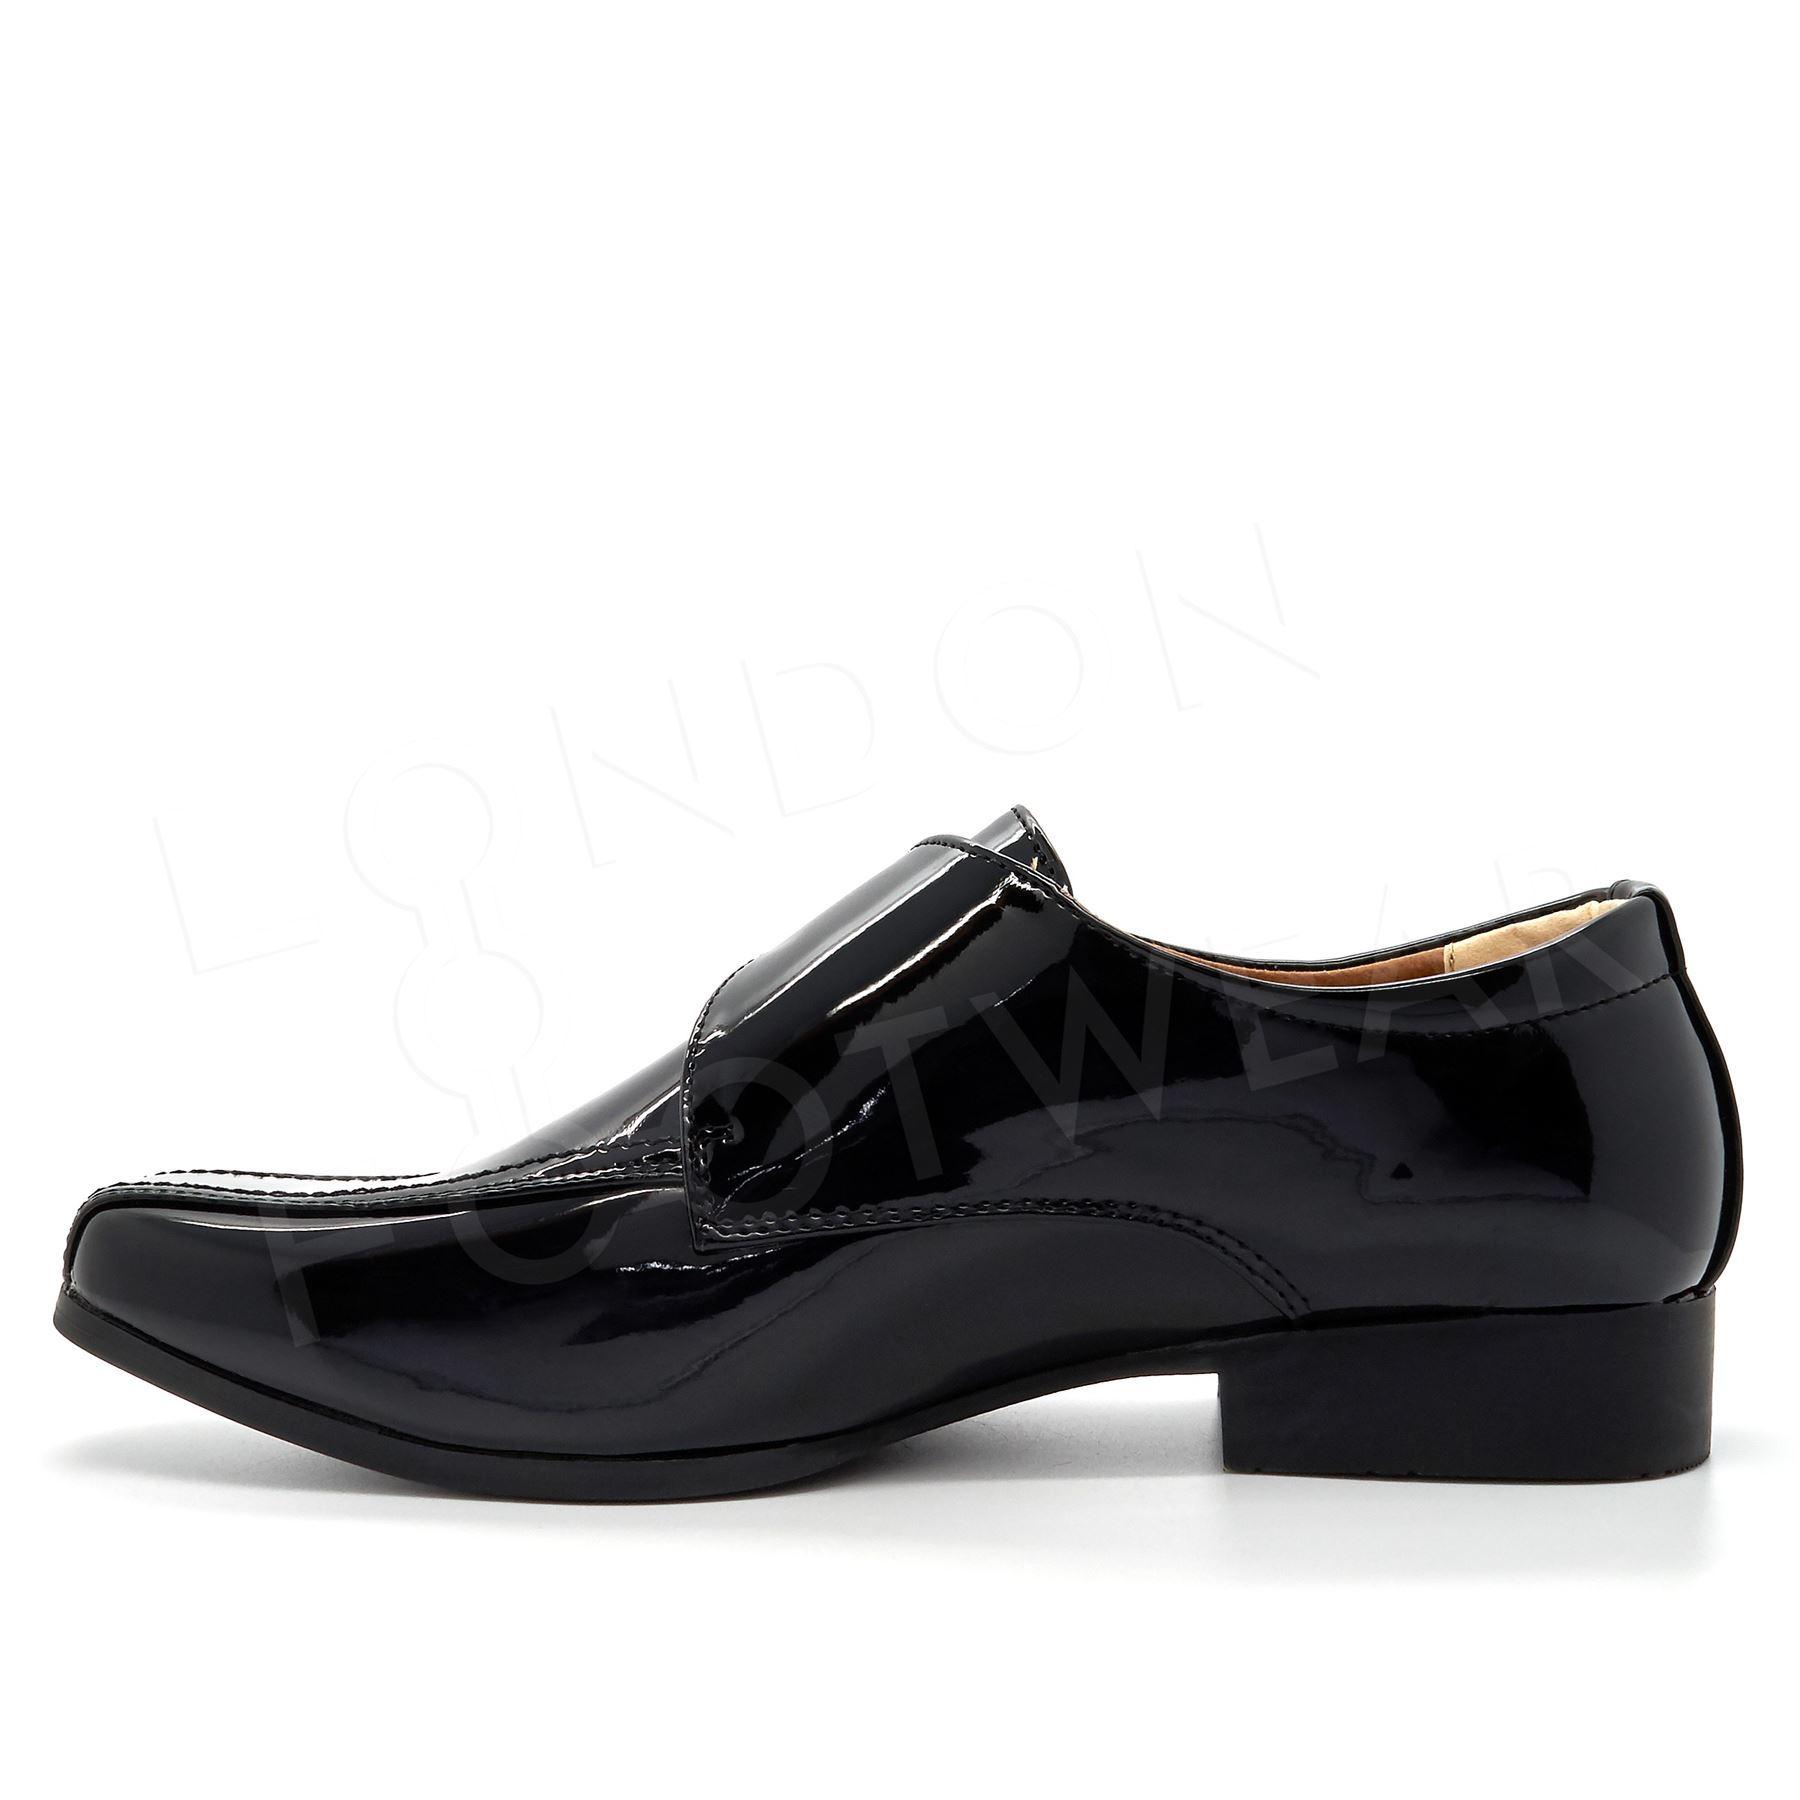 New Boys Formal Black Patent Slip On Shoes Kids Smart